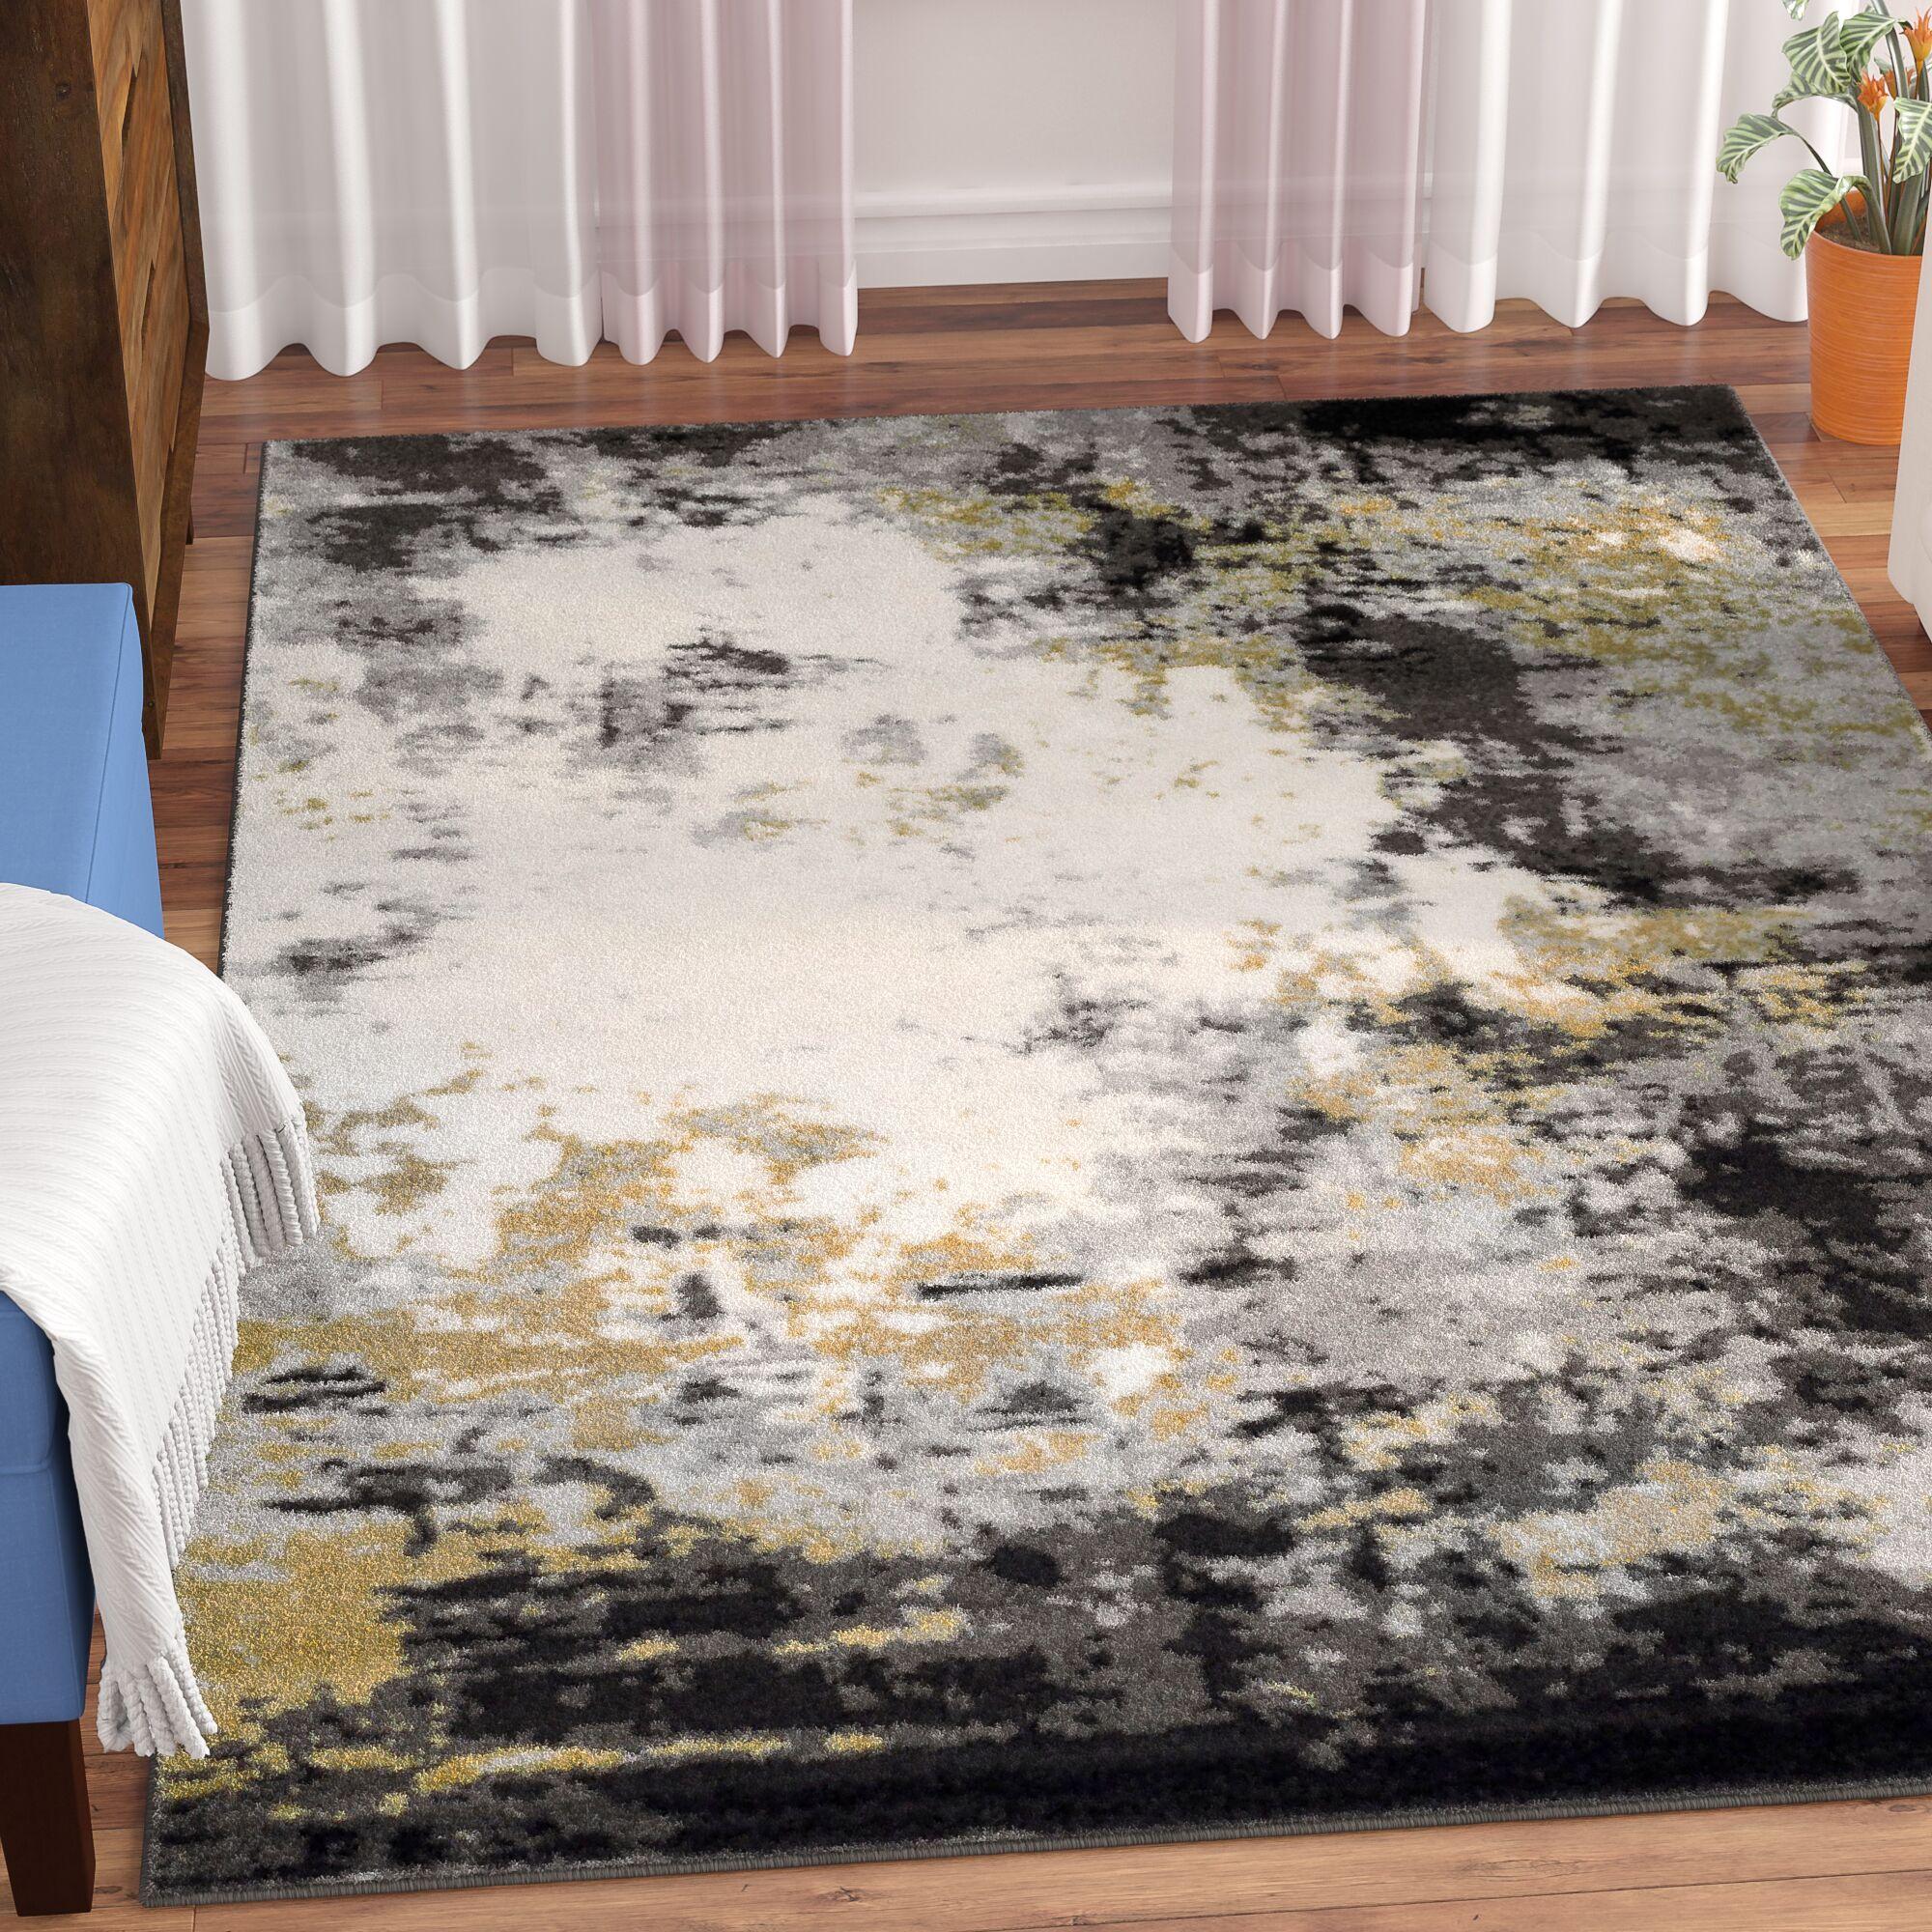 Shuff Charcoal/Mustard Yellow/Gray Area Rug Rug Size: Rectangle 5'3